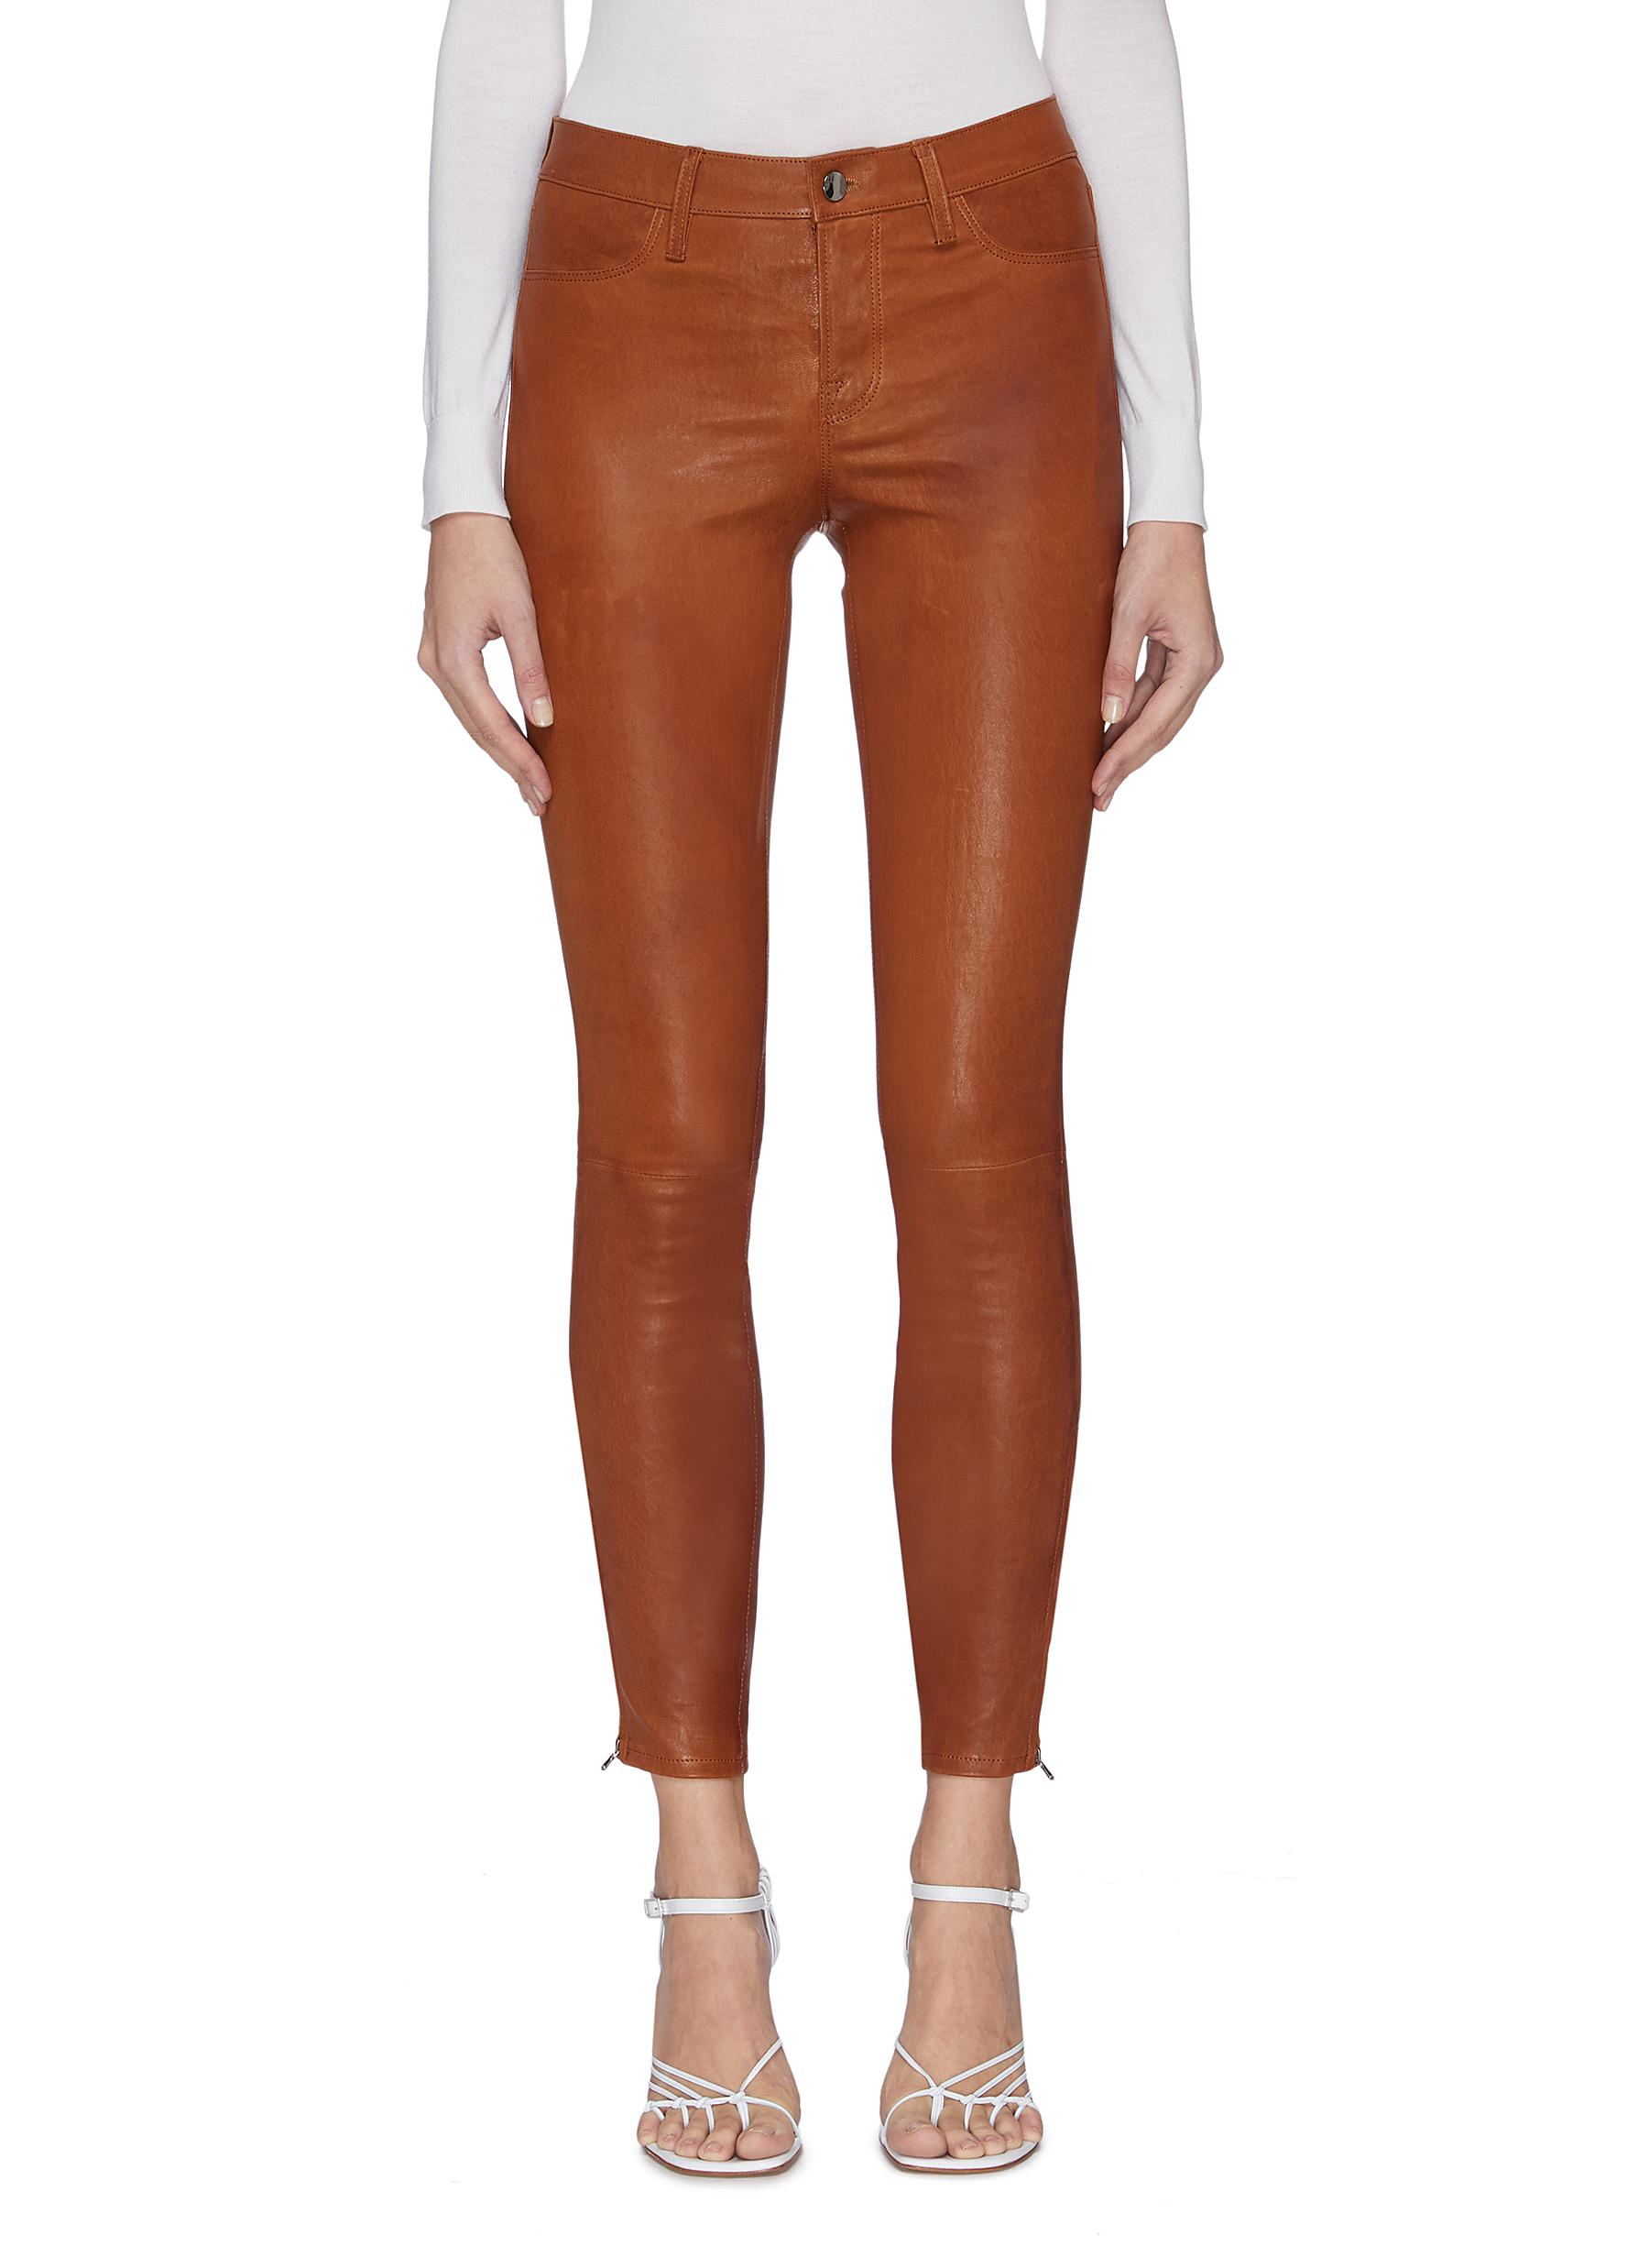 Buy J Brand Pants & Shorts Super Skinny Cuff Zip Leather Leggings